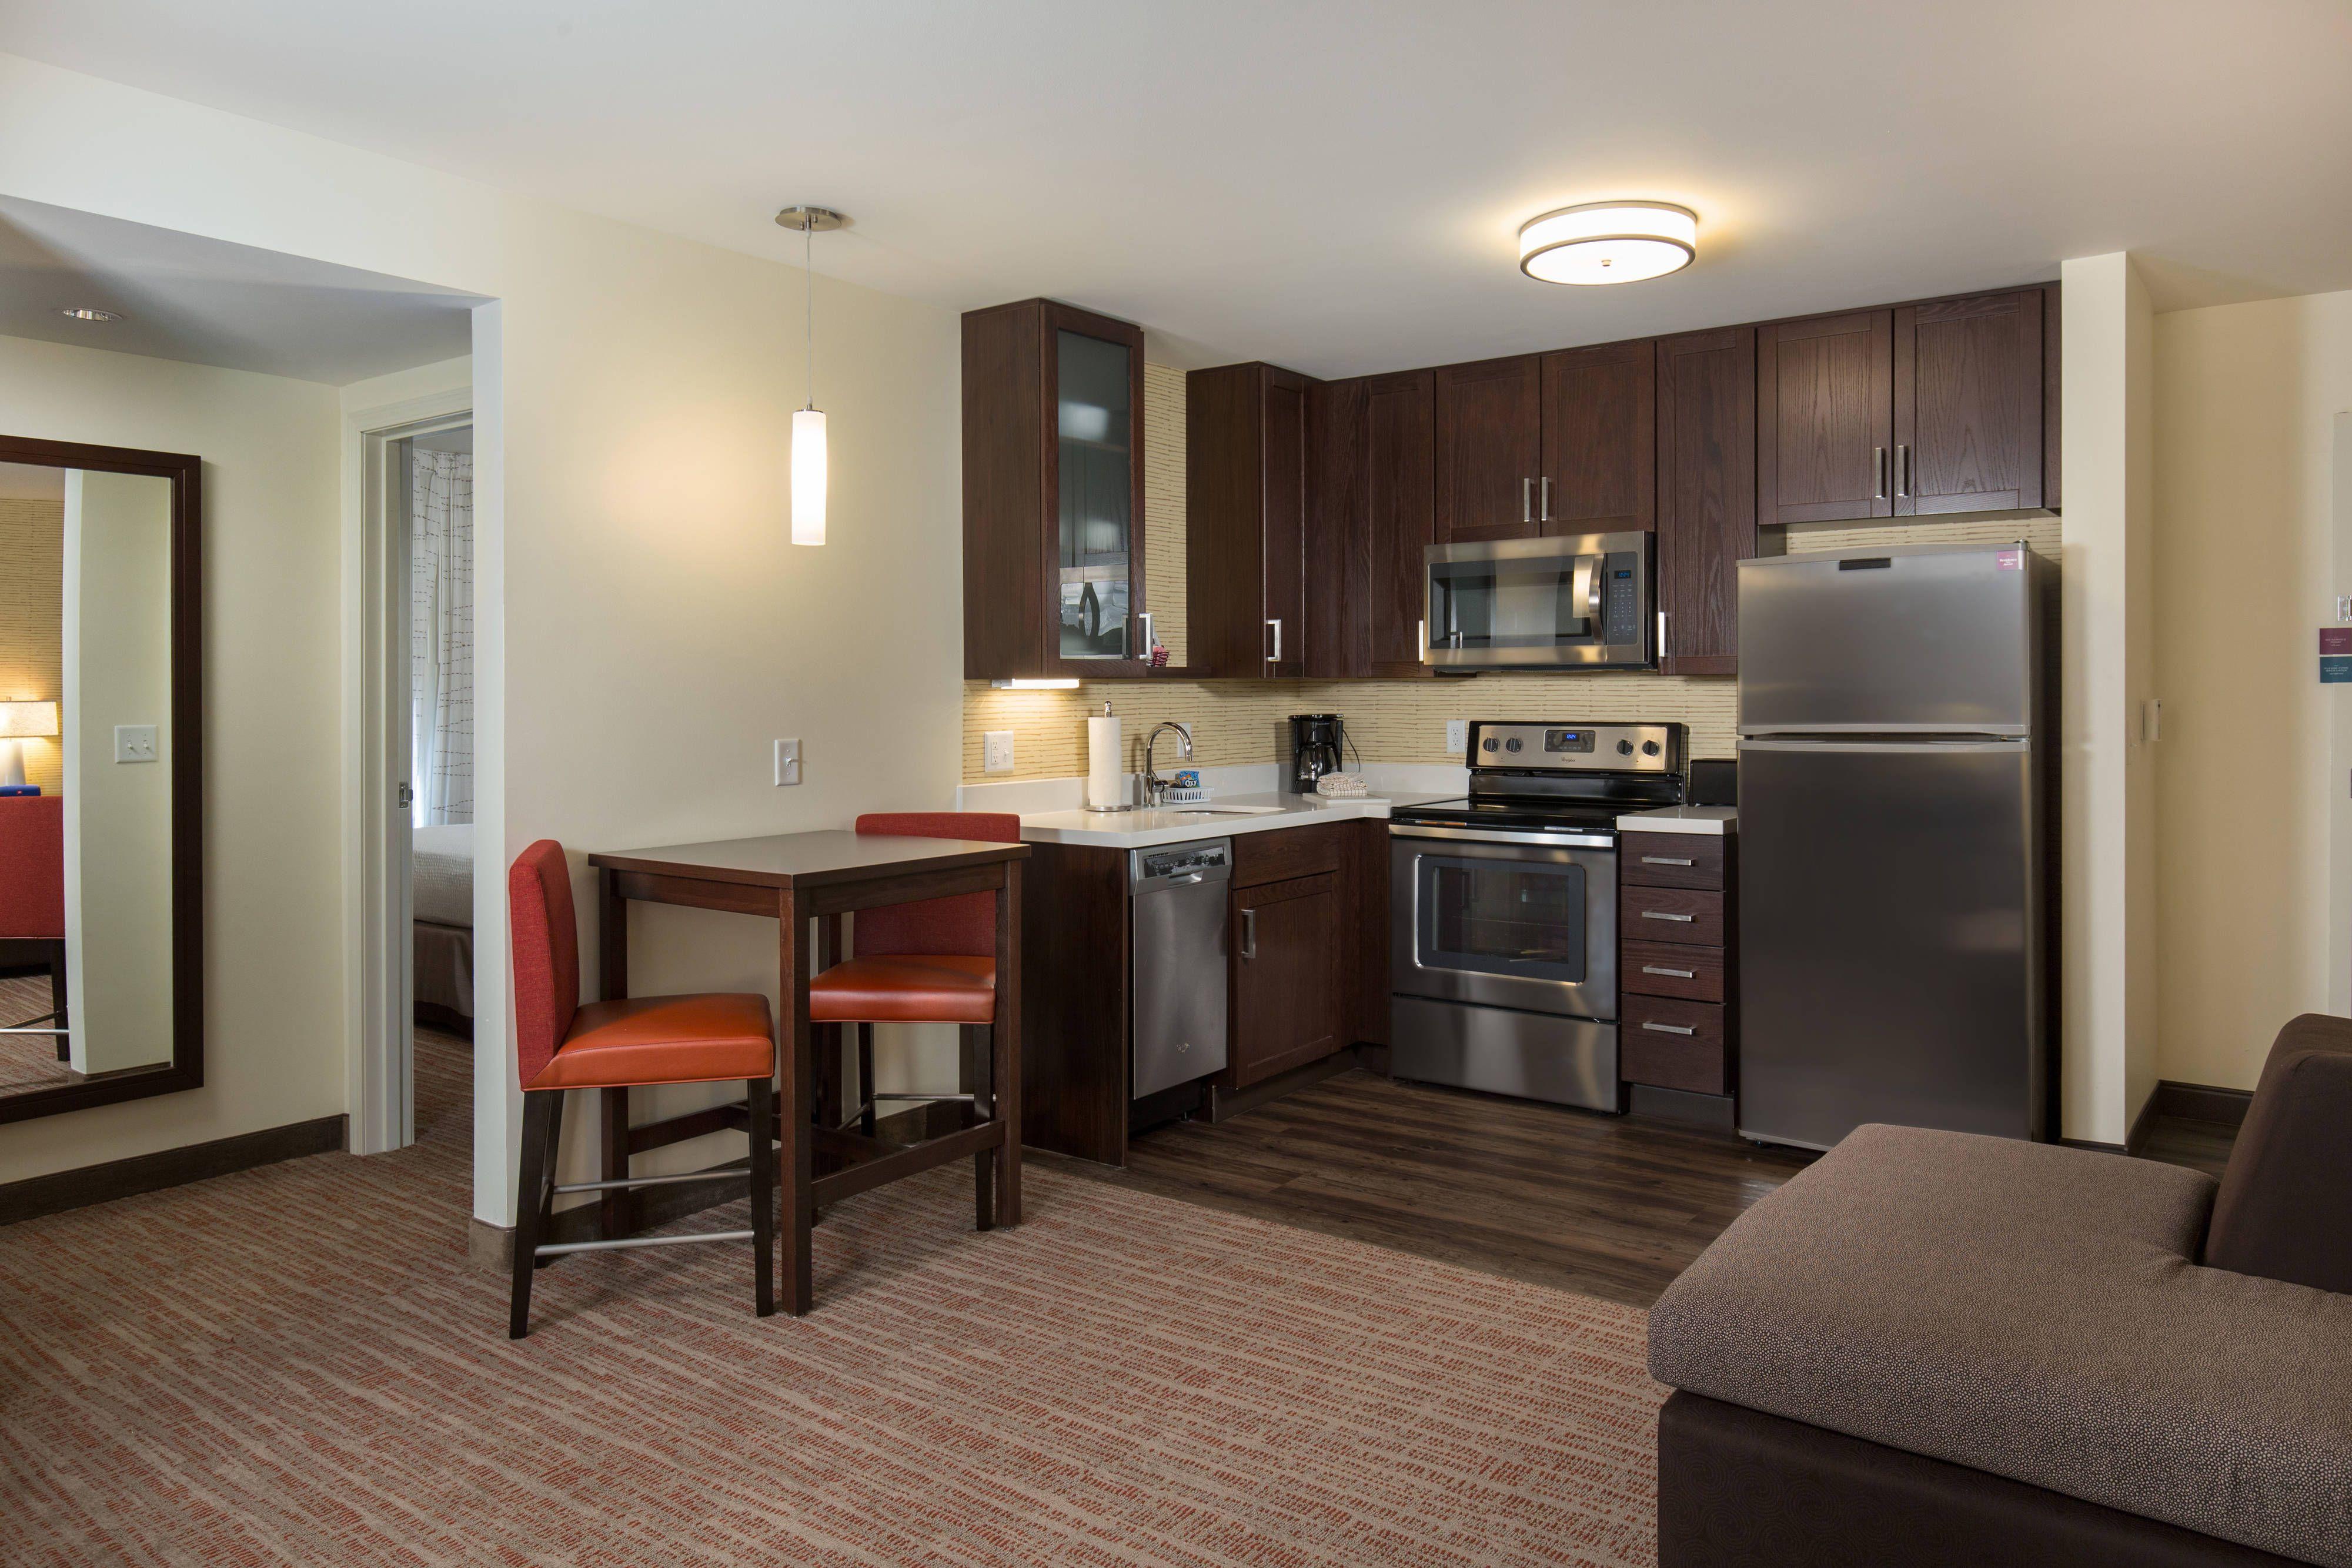 Residence Inn Denver Stapleton One Bedroom Suite Kitchen Comfort Memorable Guestroom Bedroom Suite Residences One Bedroom